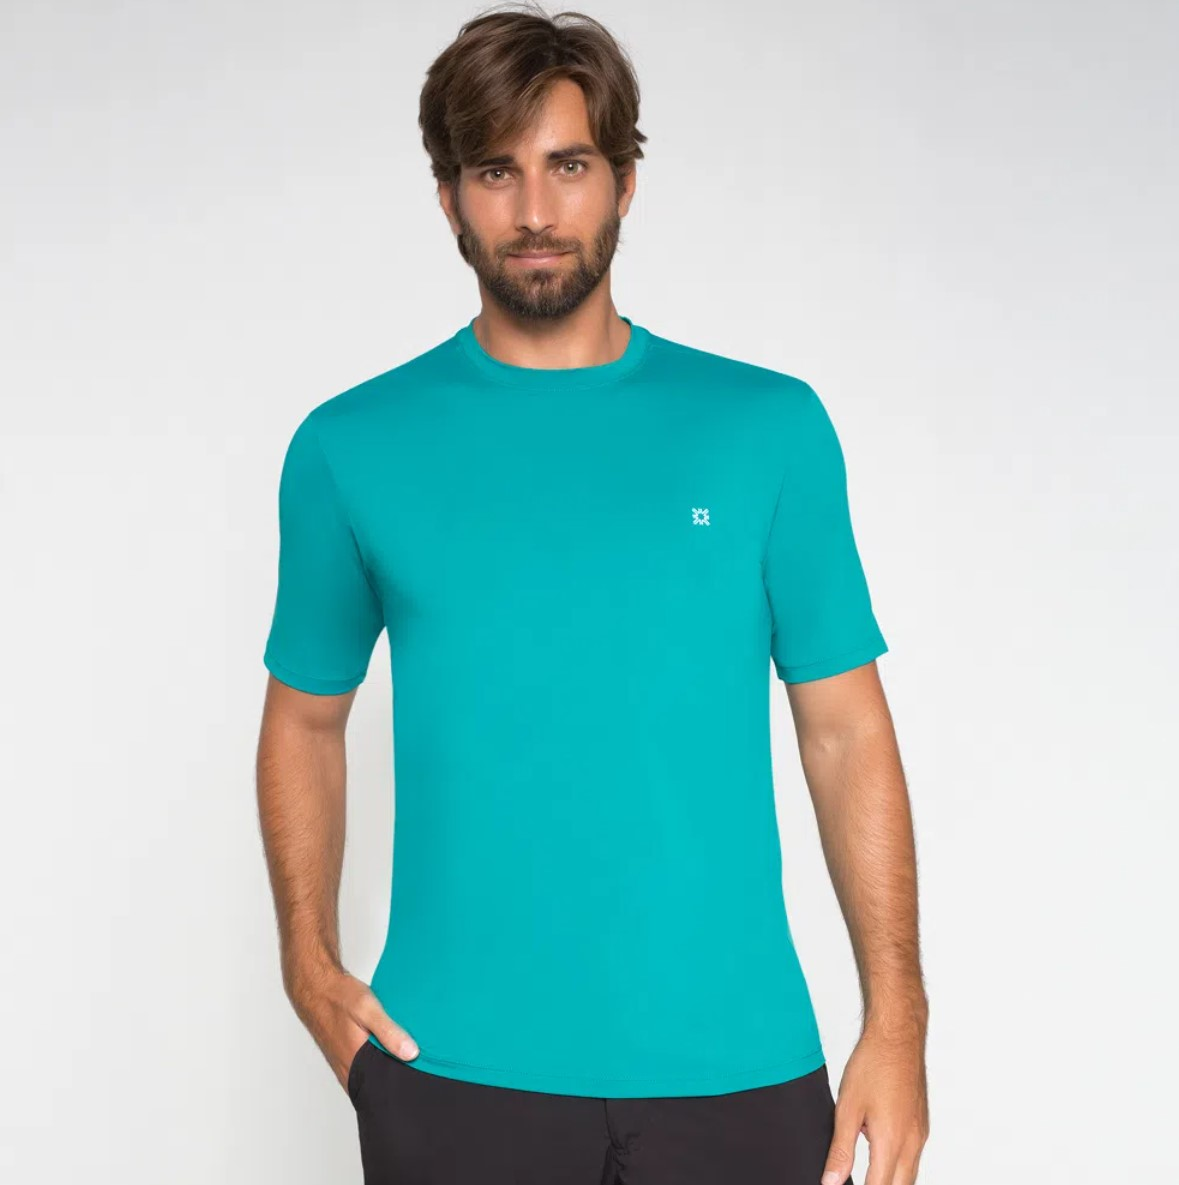 UV LINE Camiseta Uvpro Manga Curta Masculina Verde Hortelã Proteção Solar